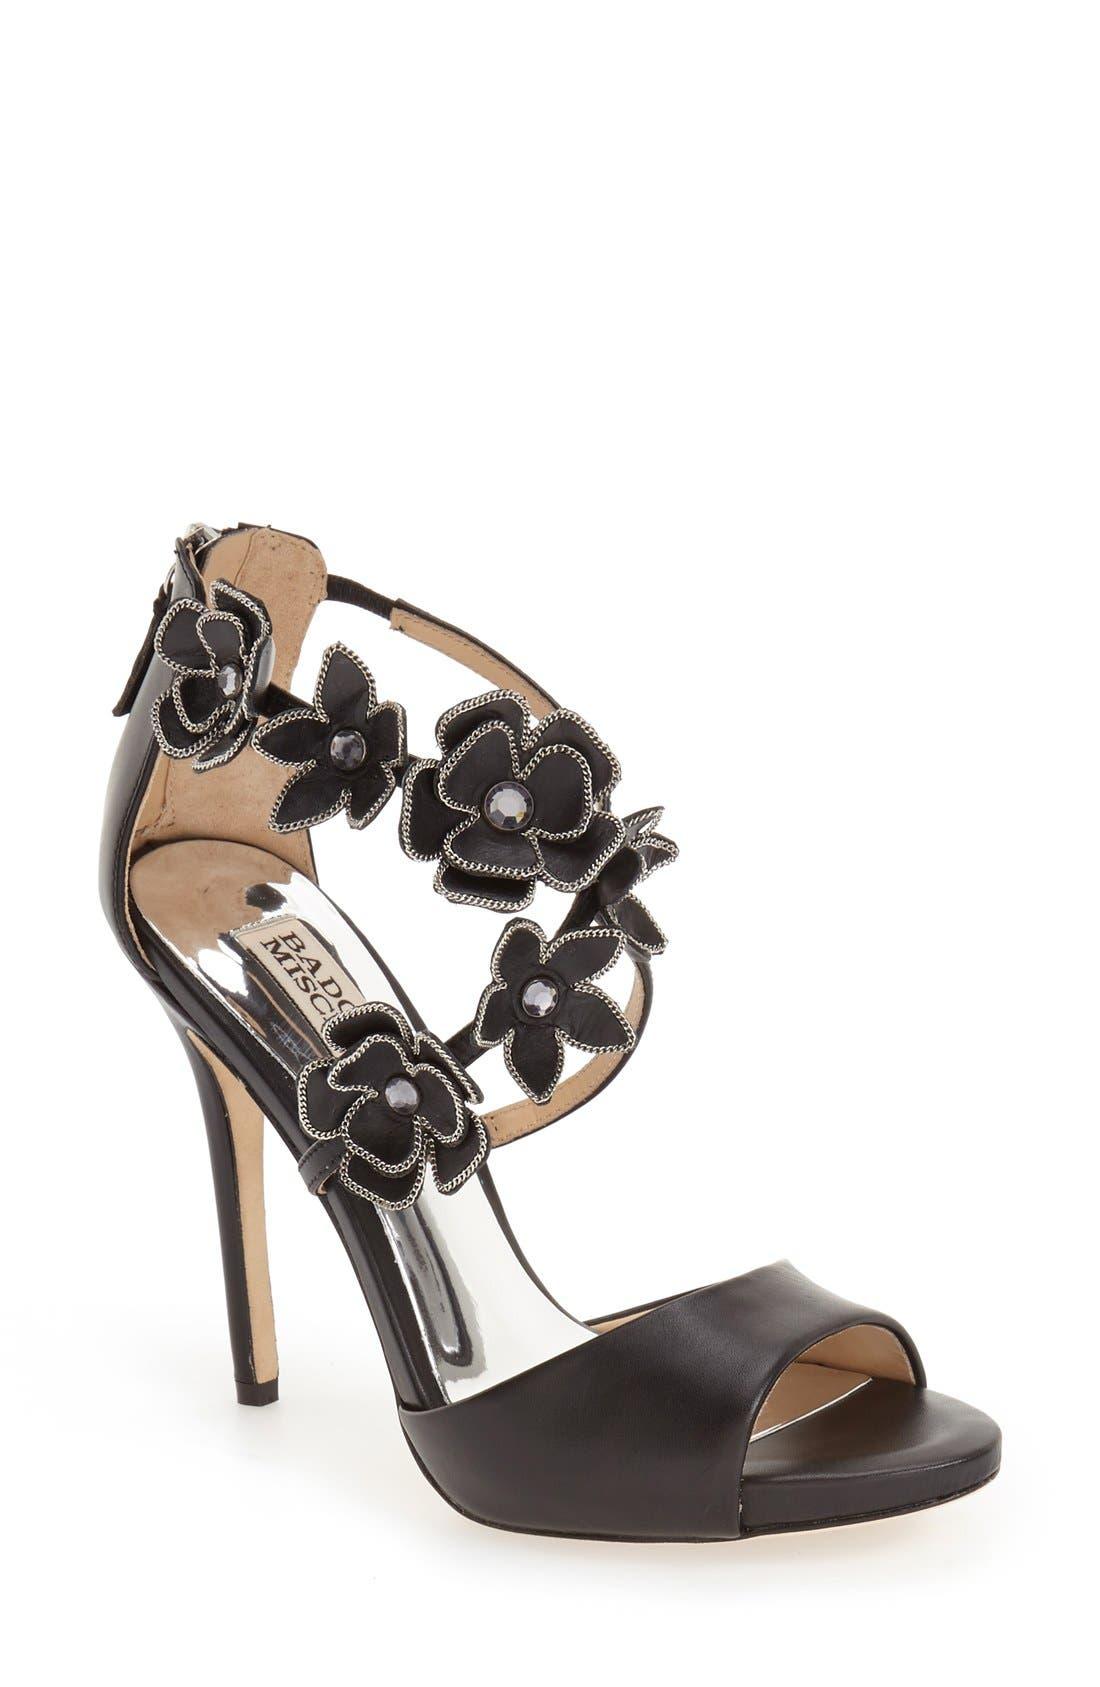 Alternate Image 1 Selected - Badgley Mischka 'Langley' Floral Appliqué Sandal (Women)